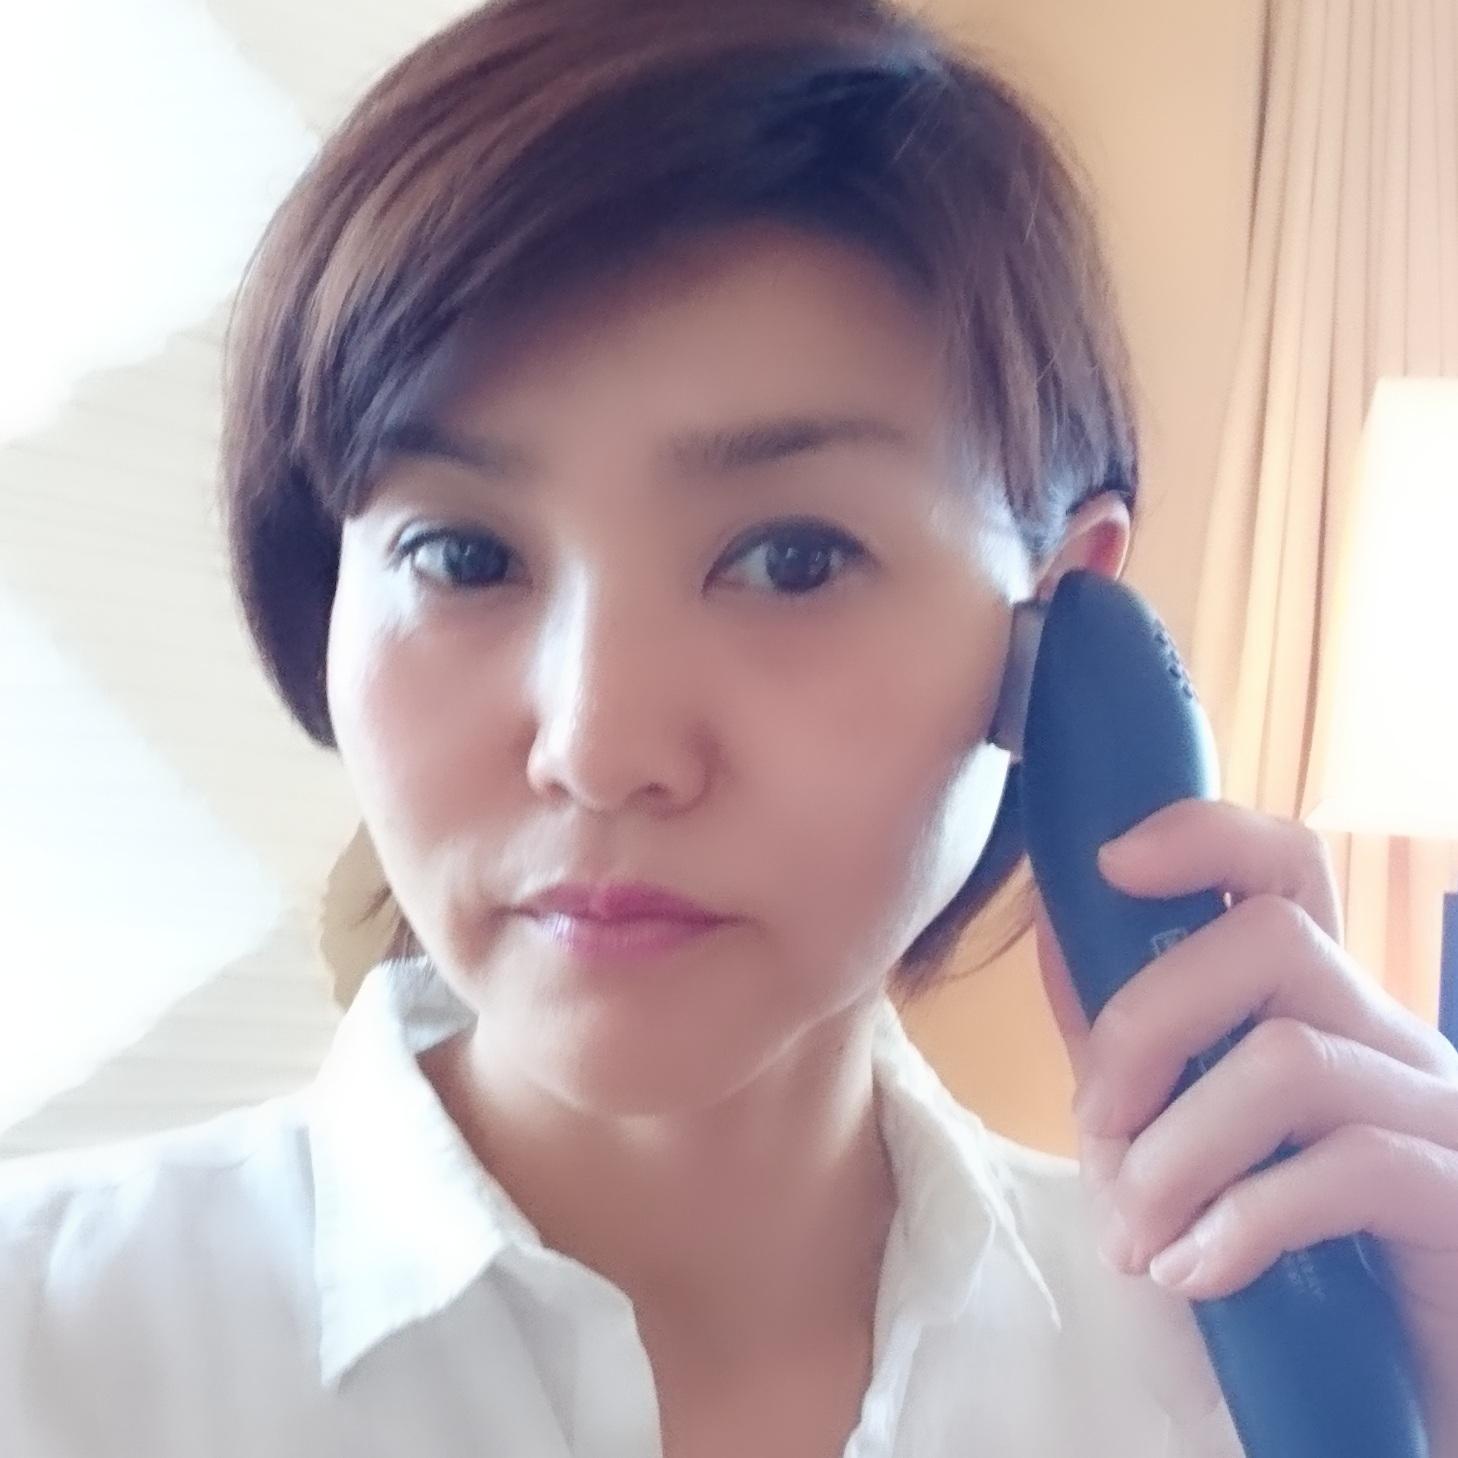 Panasonicから発売の美容家電&高機能化粧品を体験_1_2